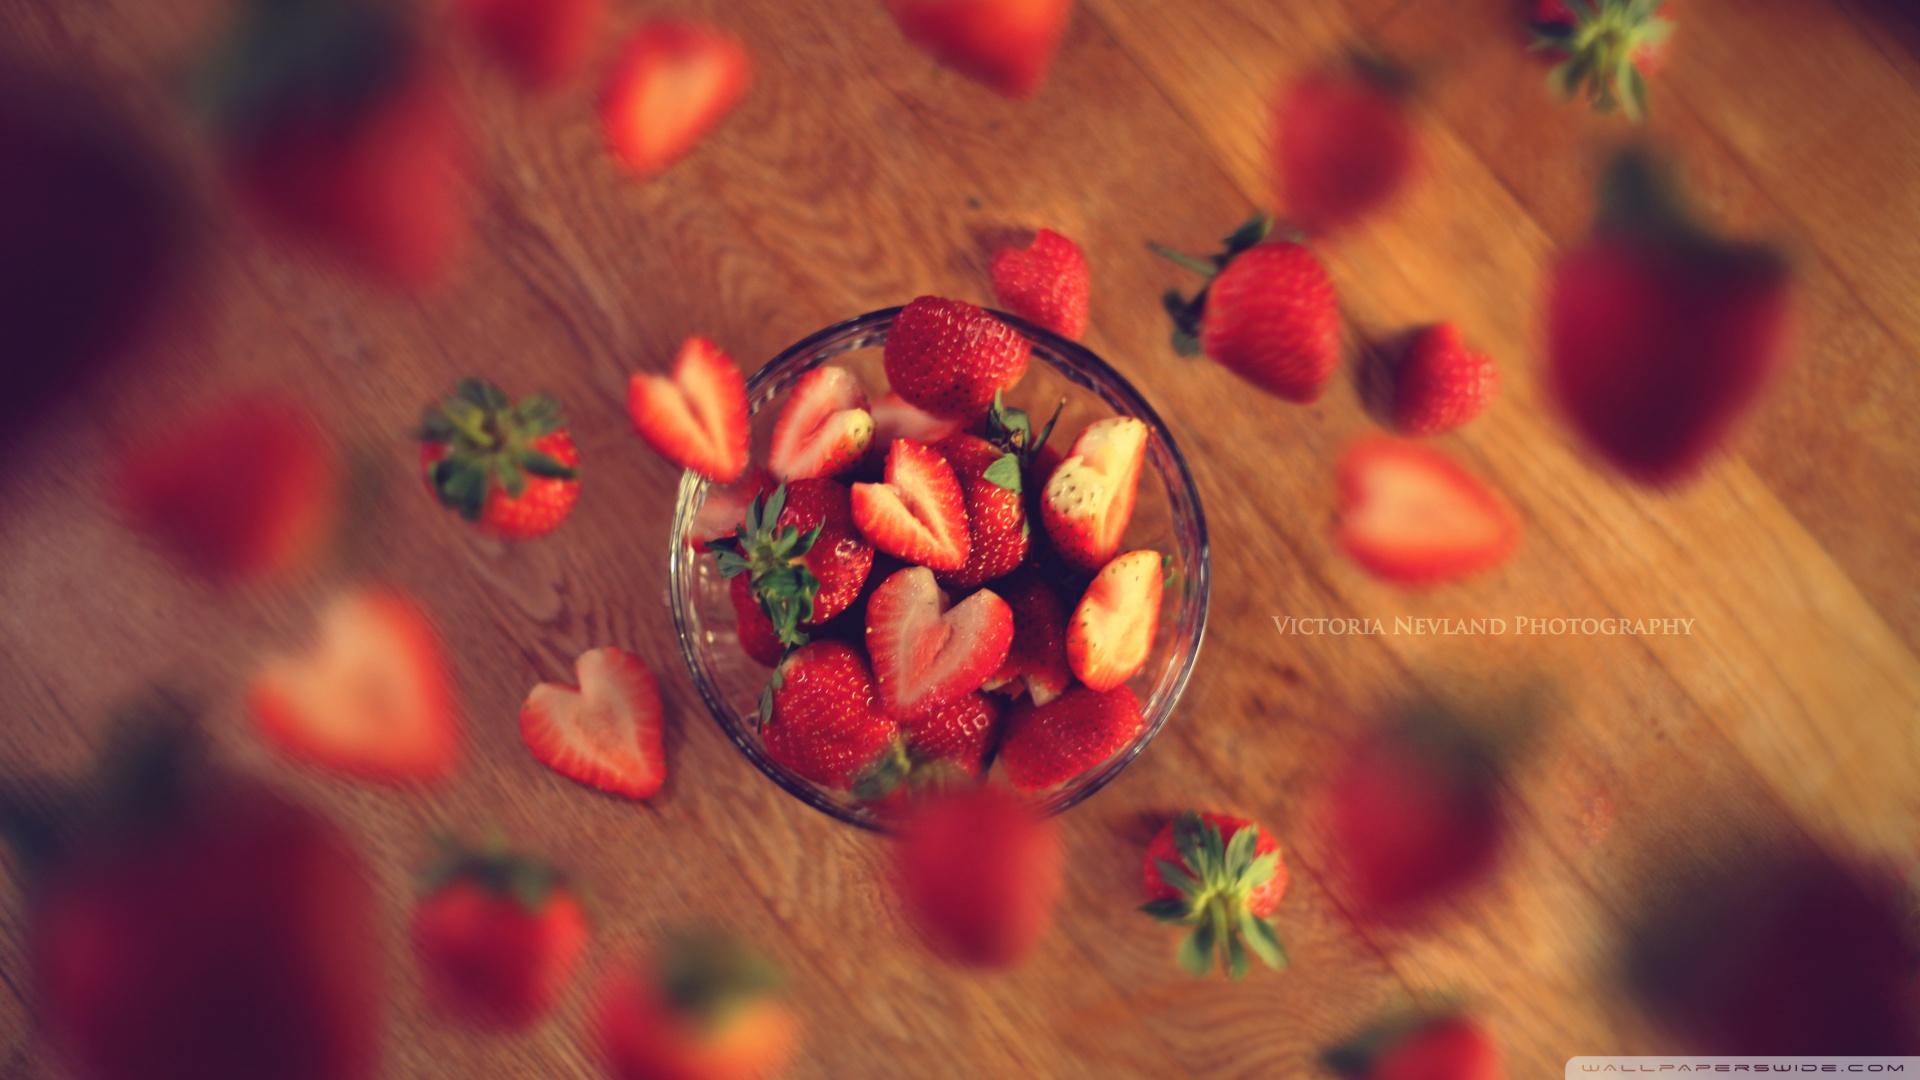 Wallpaper Strawberry Cute Very Berry Strawberry 4k Hd Desktop Wallpaper For 4k Ultra